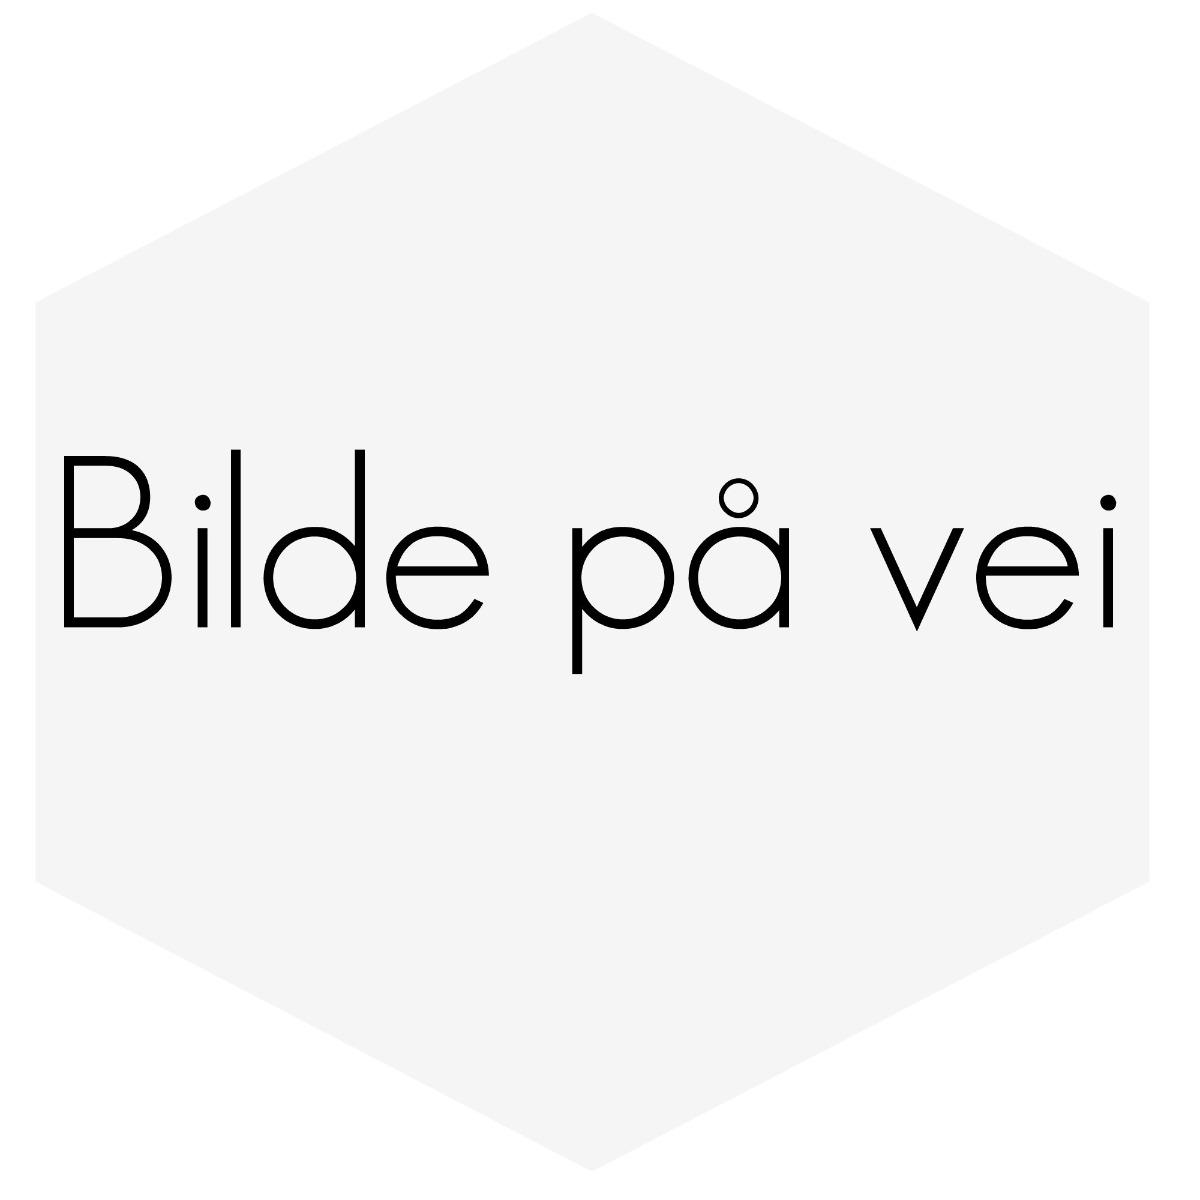 ENDELEDD YTRE VOLVO S60-S80-V70 1999 272417